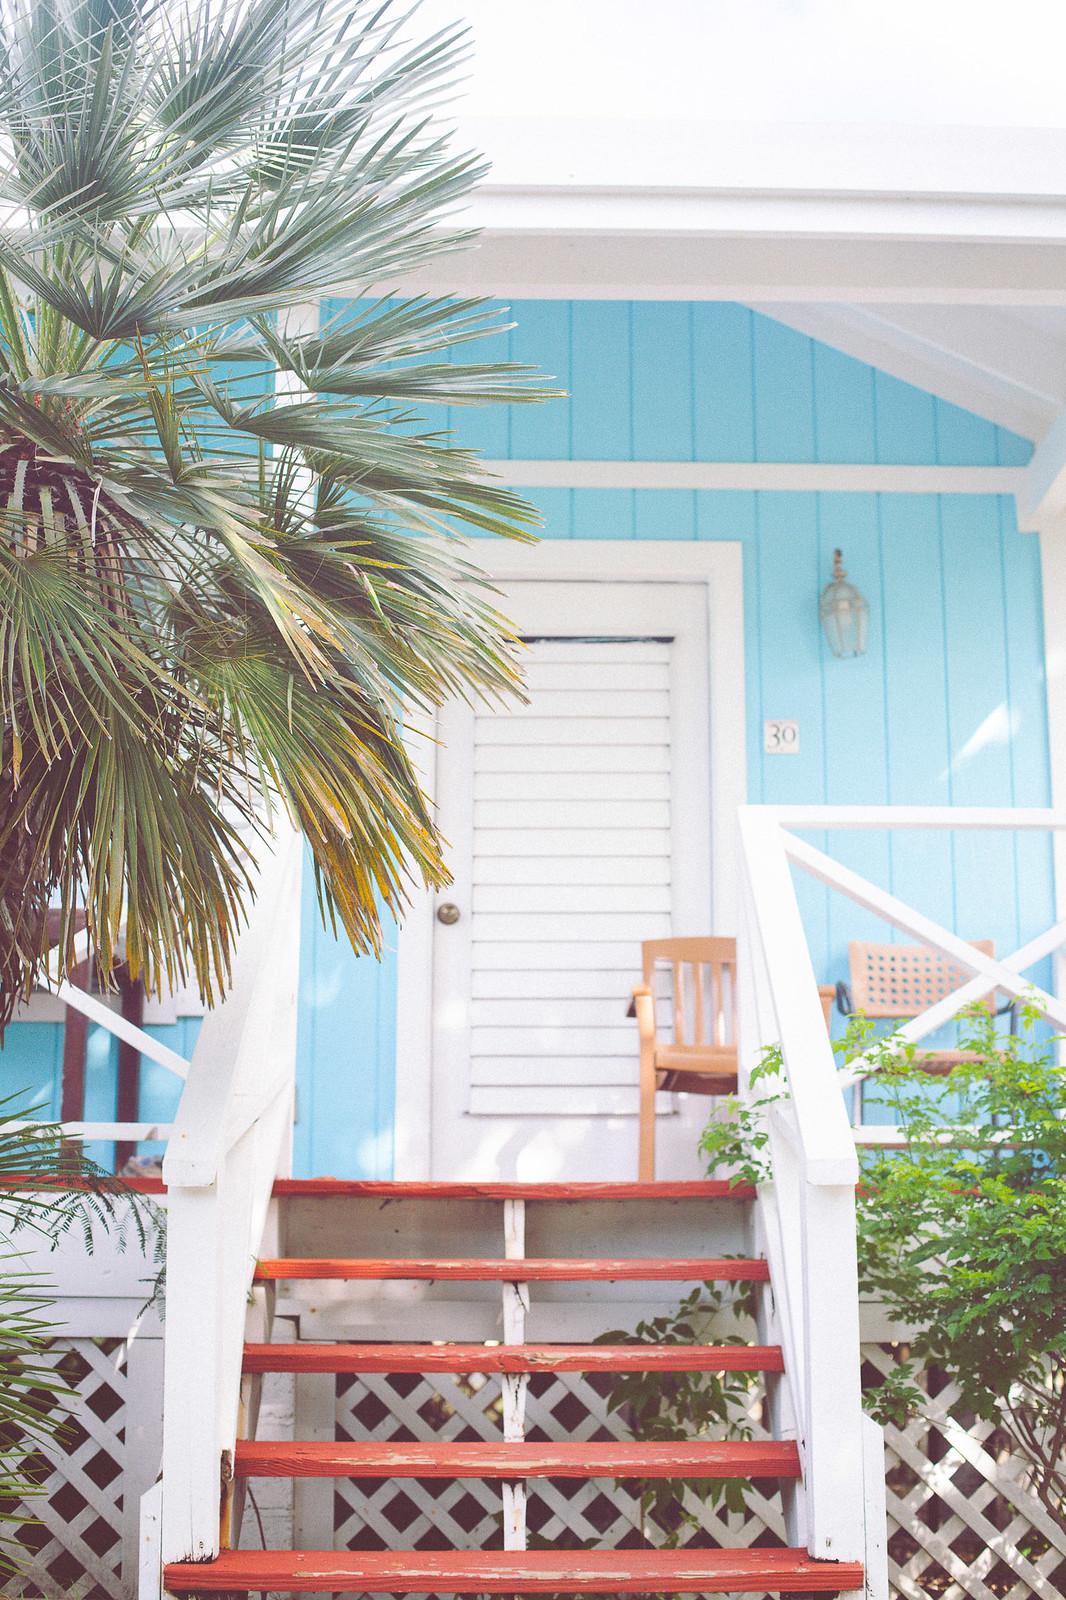 Chenay Bay St. Croix